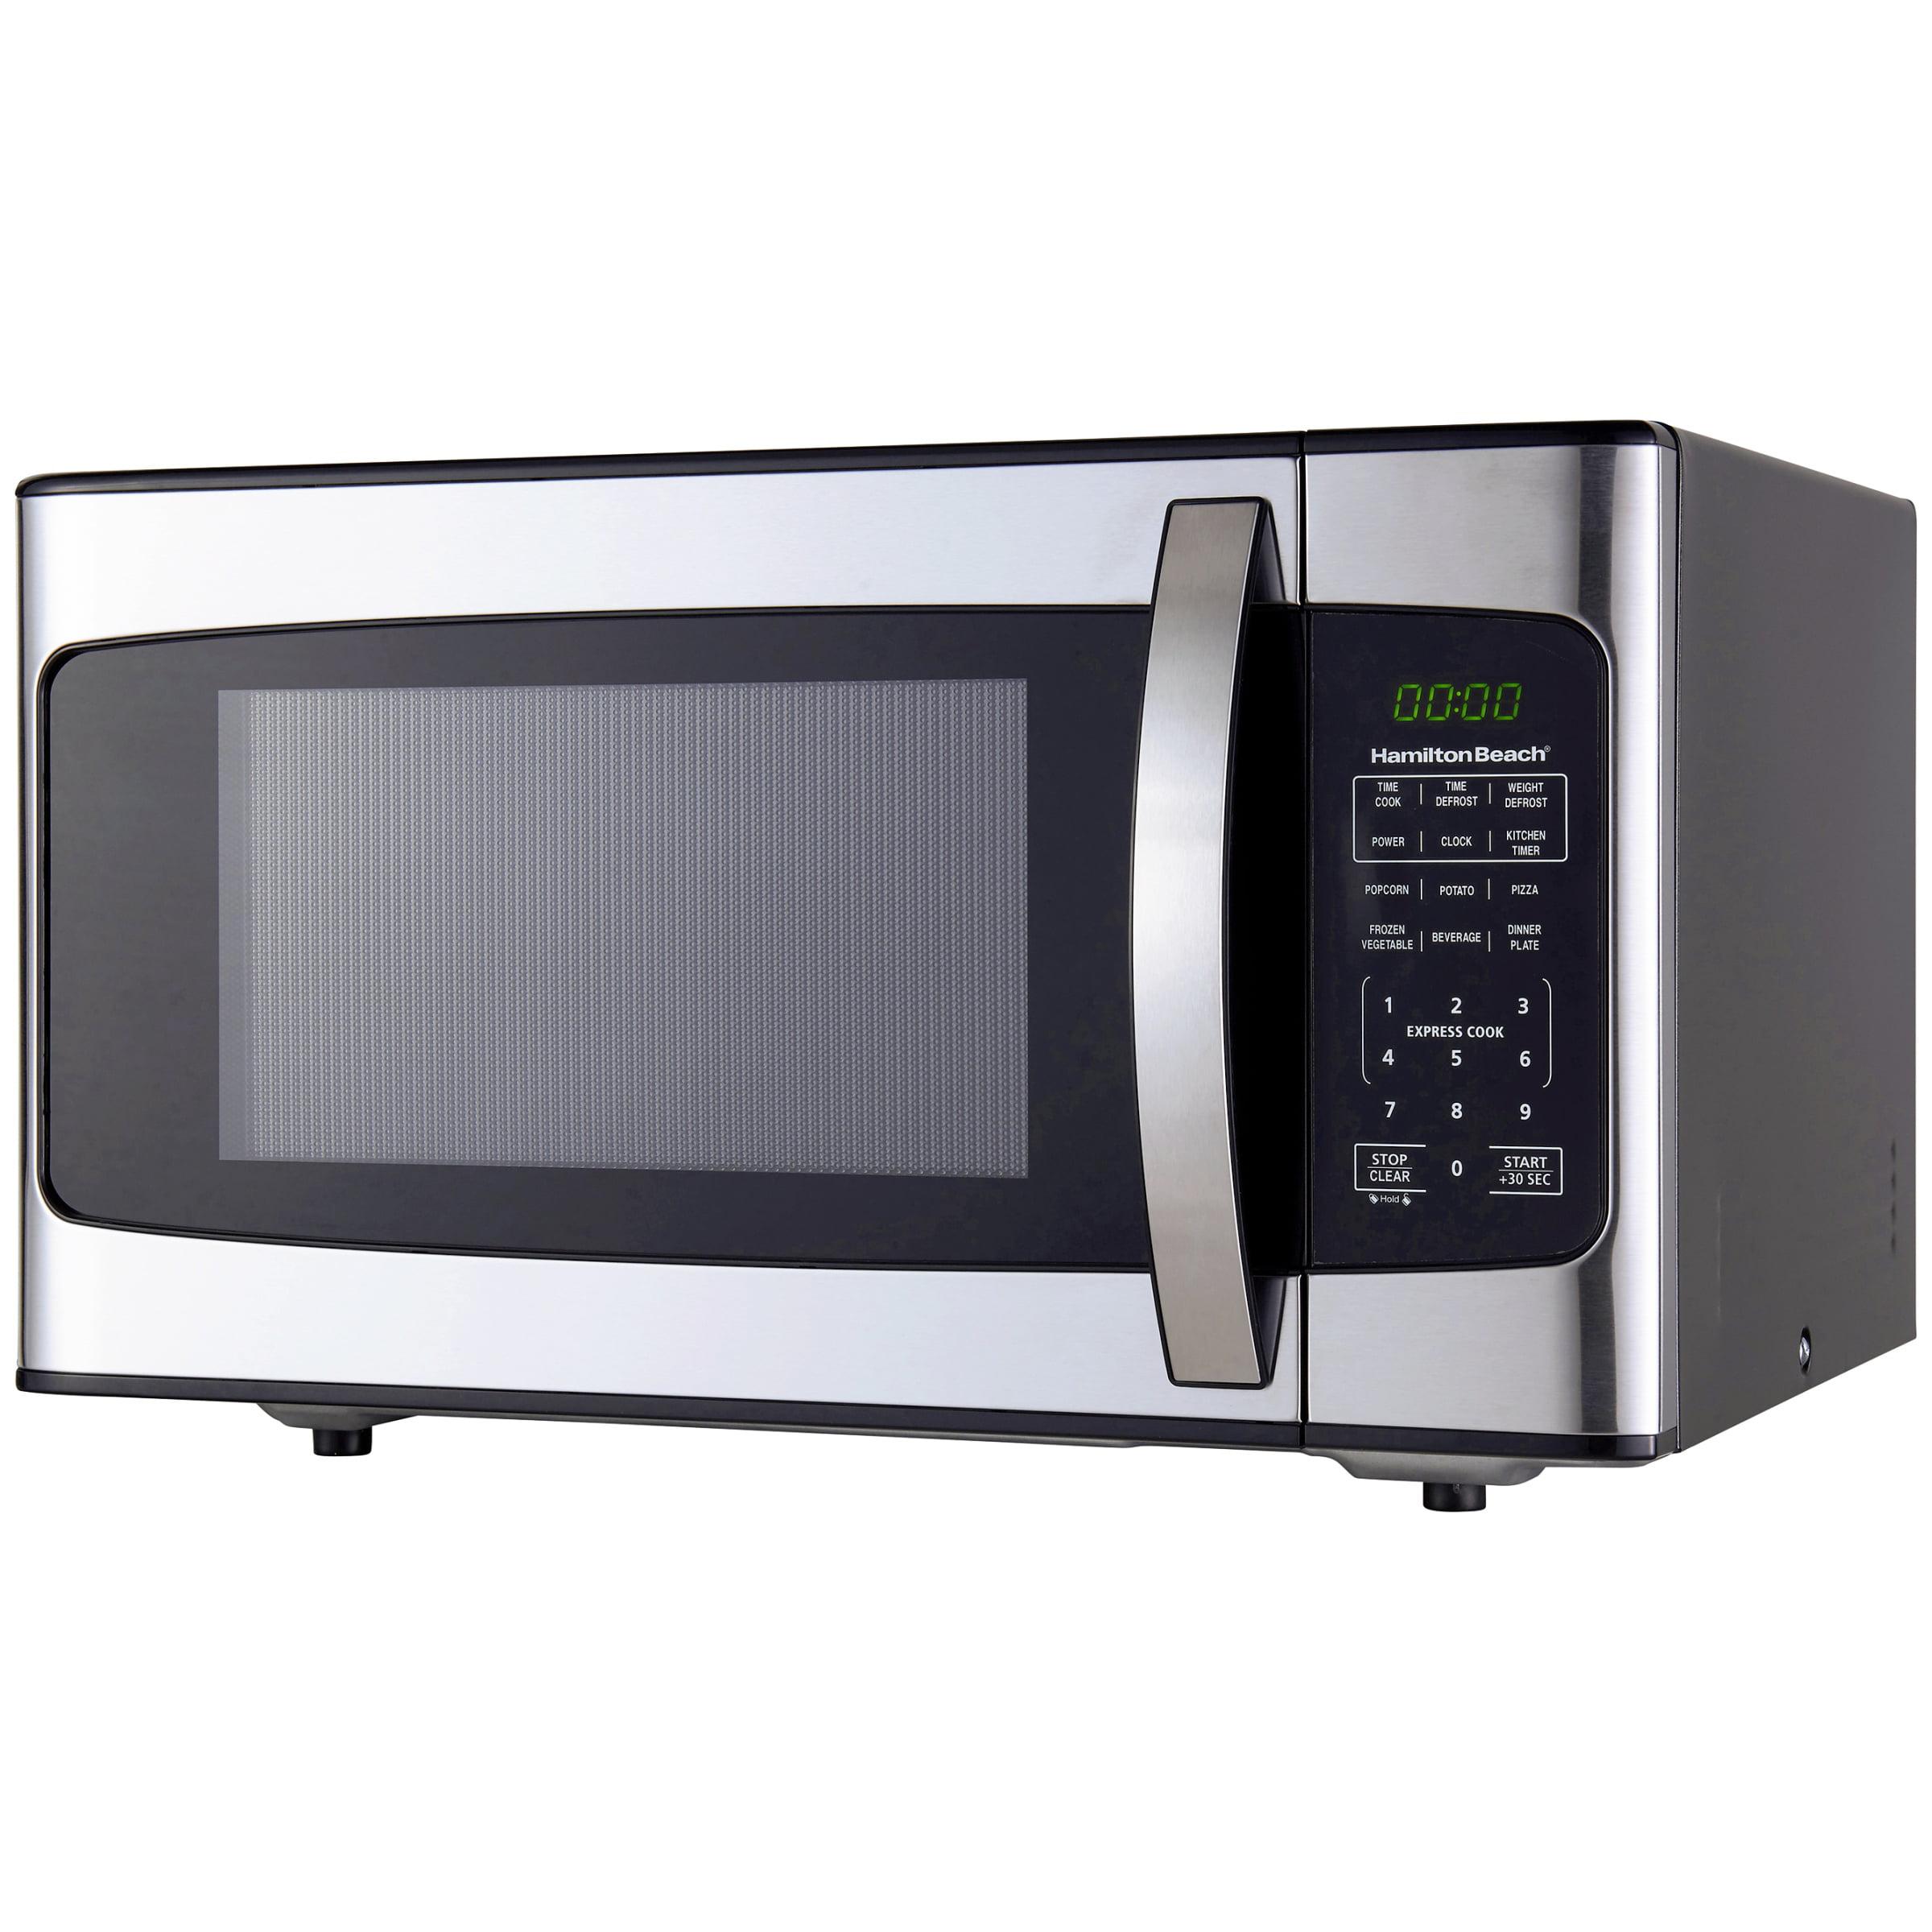 Hamilton Beach 1 Cu Ft 1000w Stainless Steel Microwave